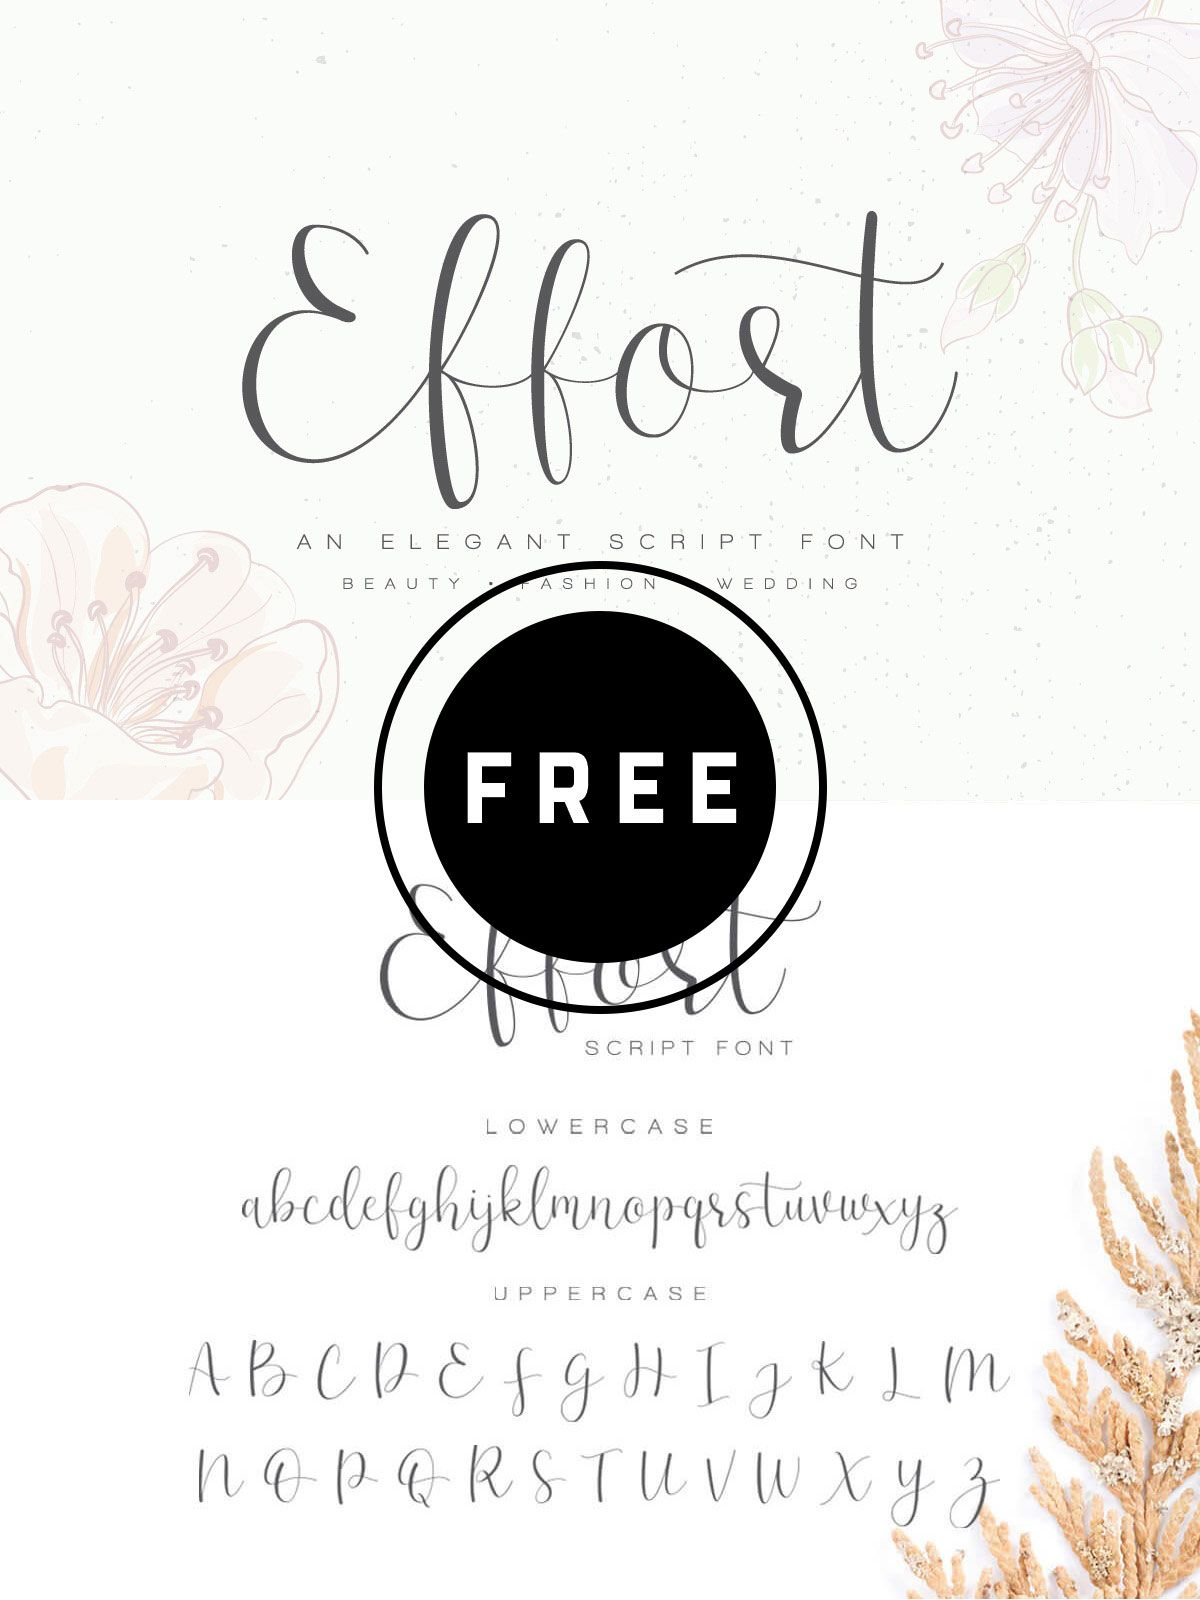 Free Effort Calligraphy Script Font Free Script Fonts Free Cursive Fonts Script Fonts